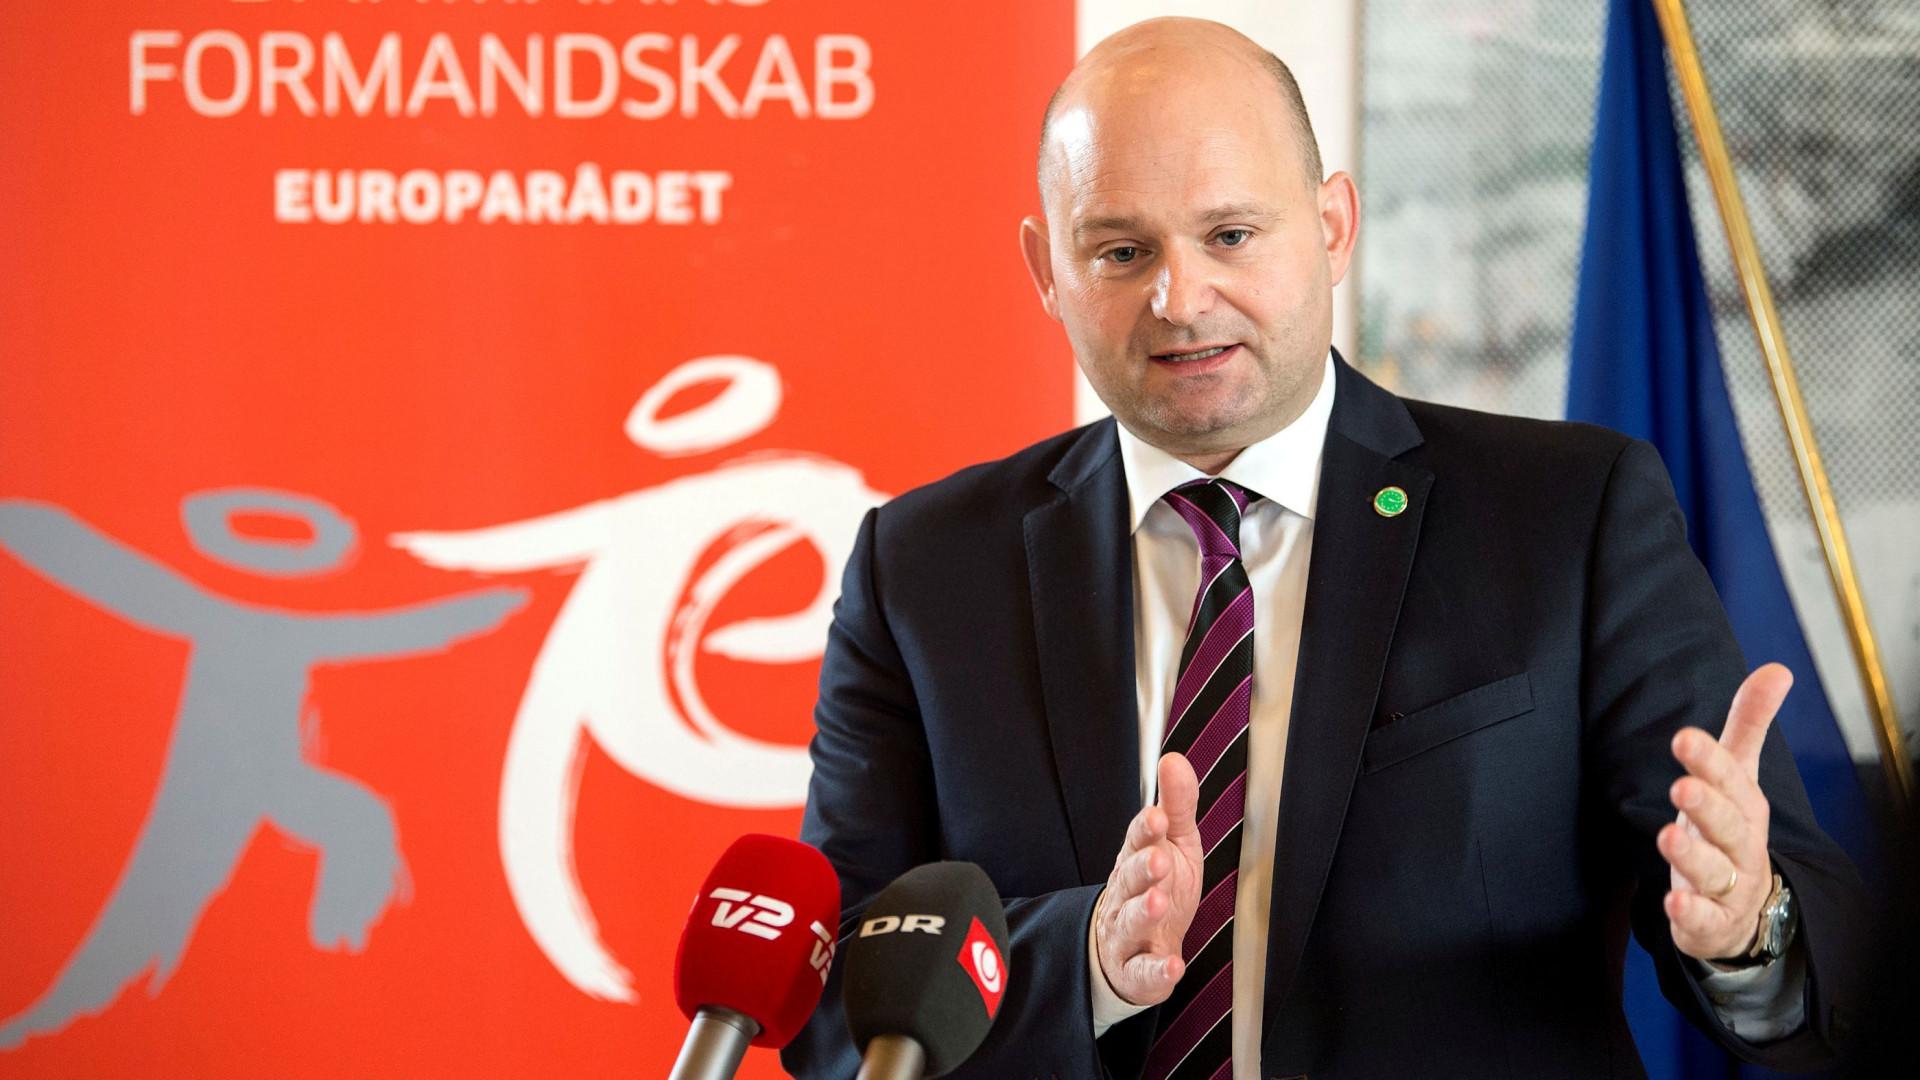 Noivo de ministro dinamarquês agredido por ser homossexual